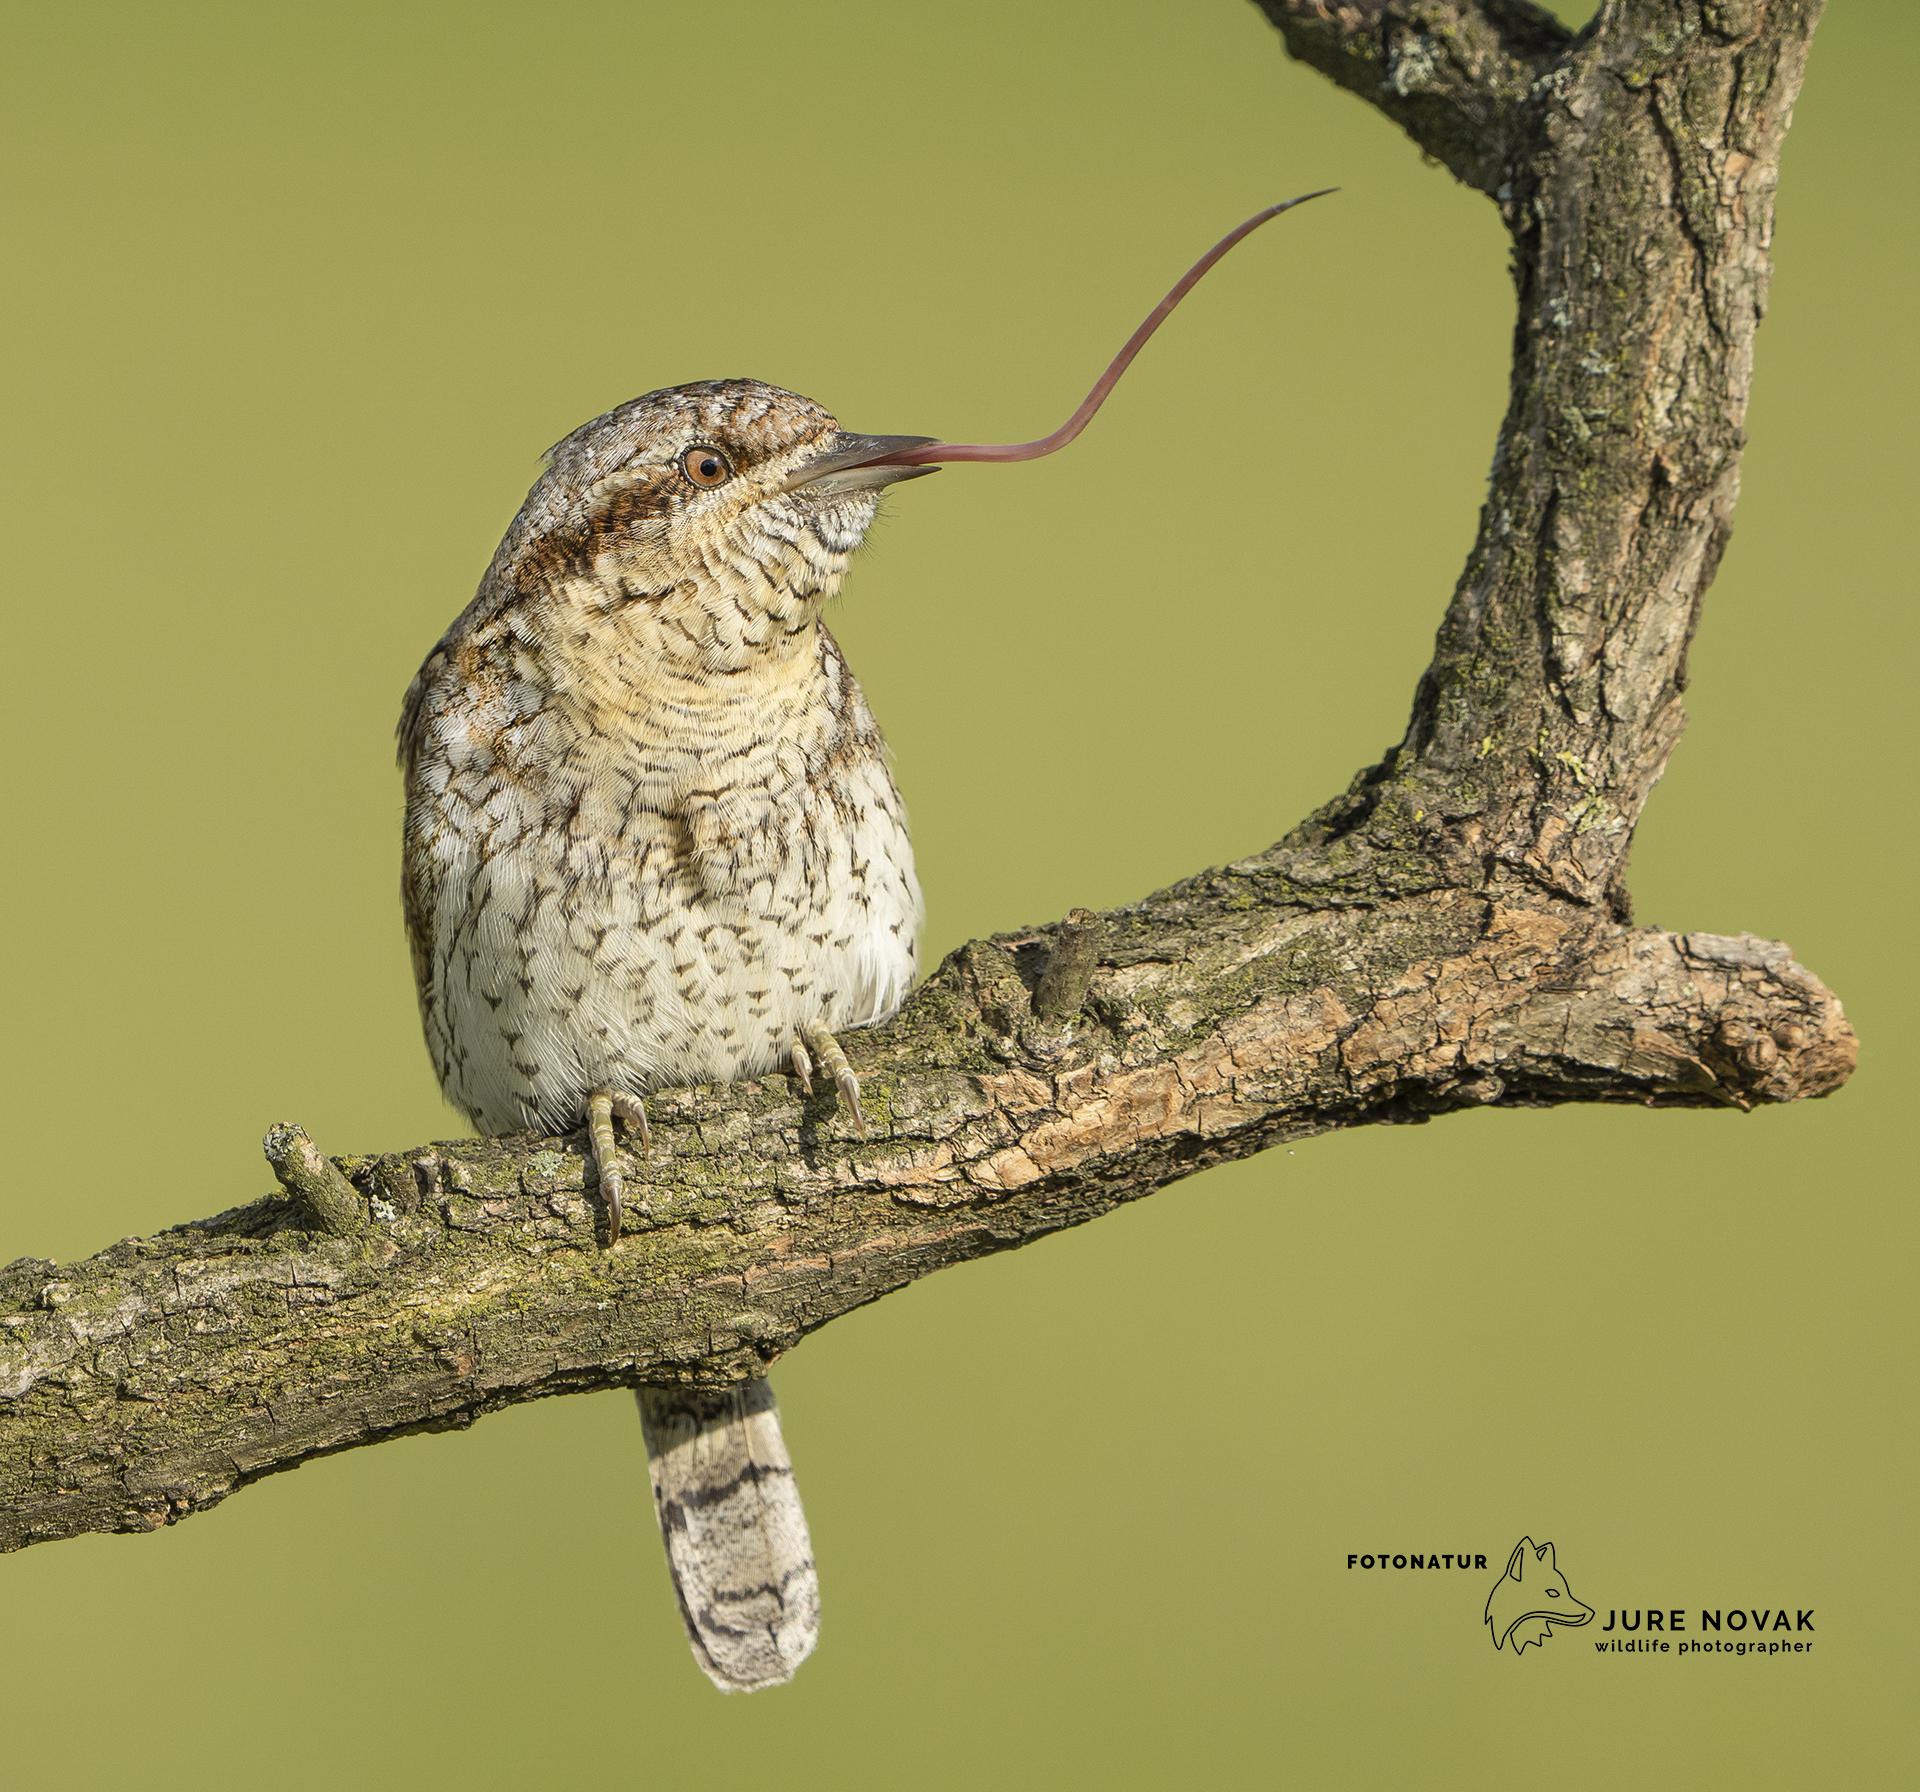 Wildlife photography with Fotonatur